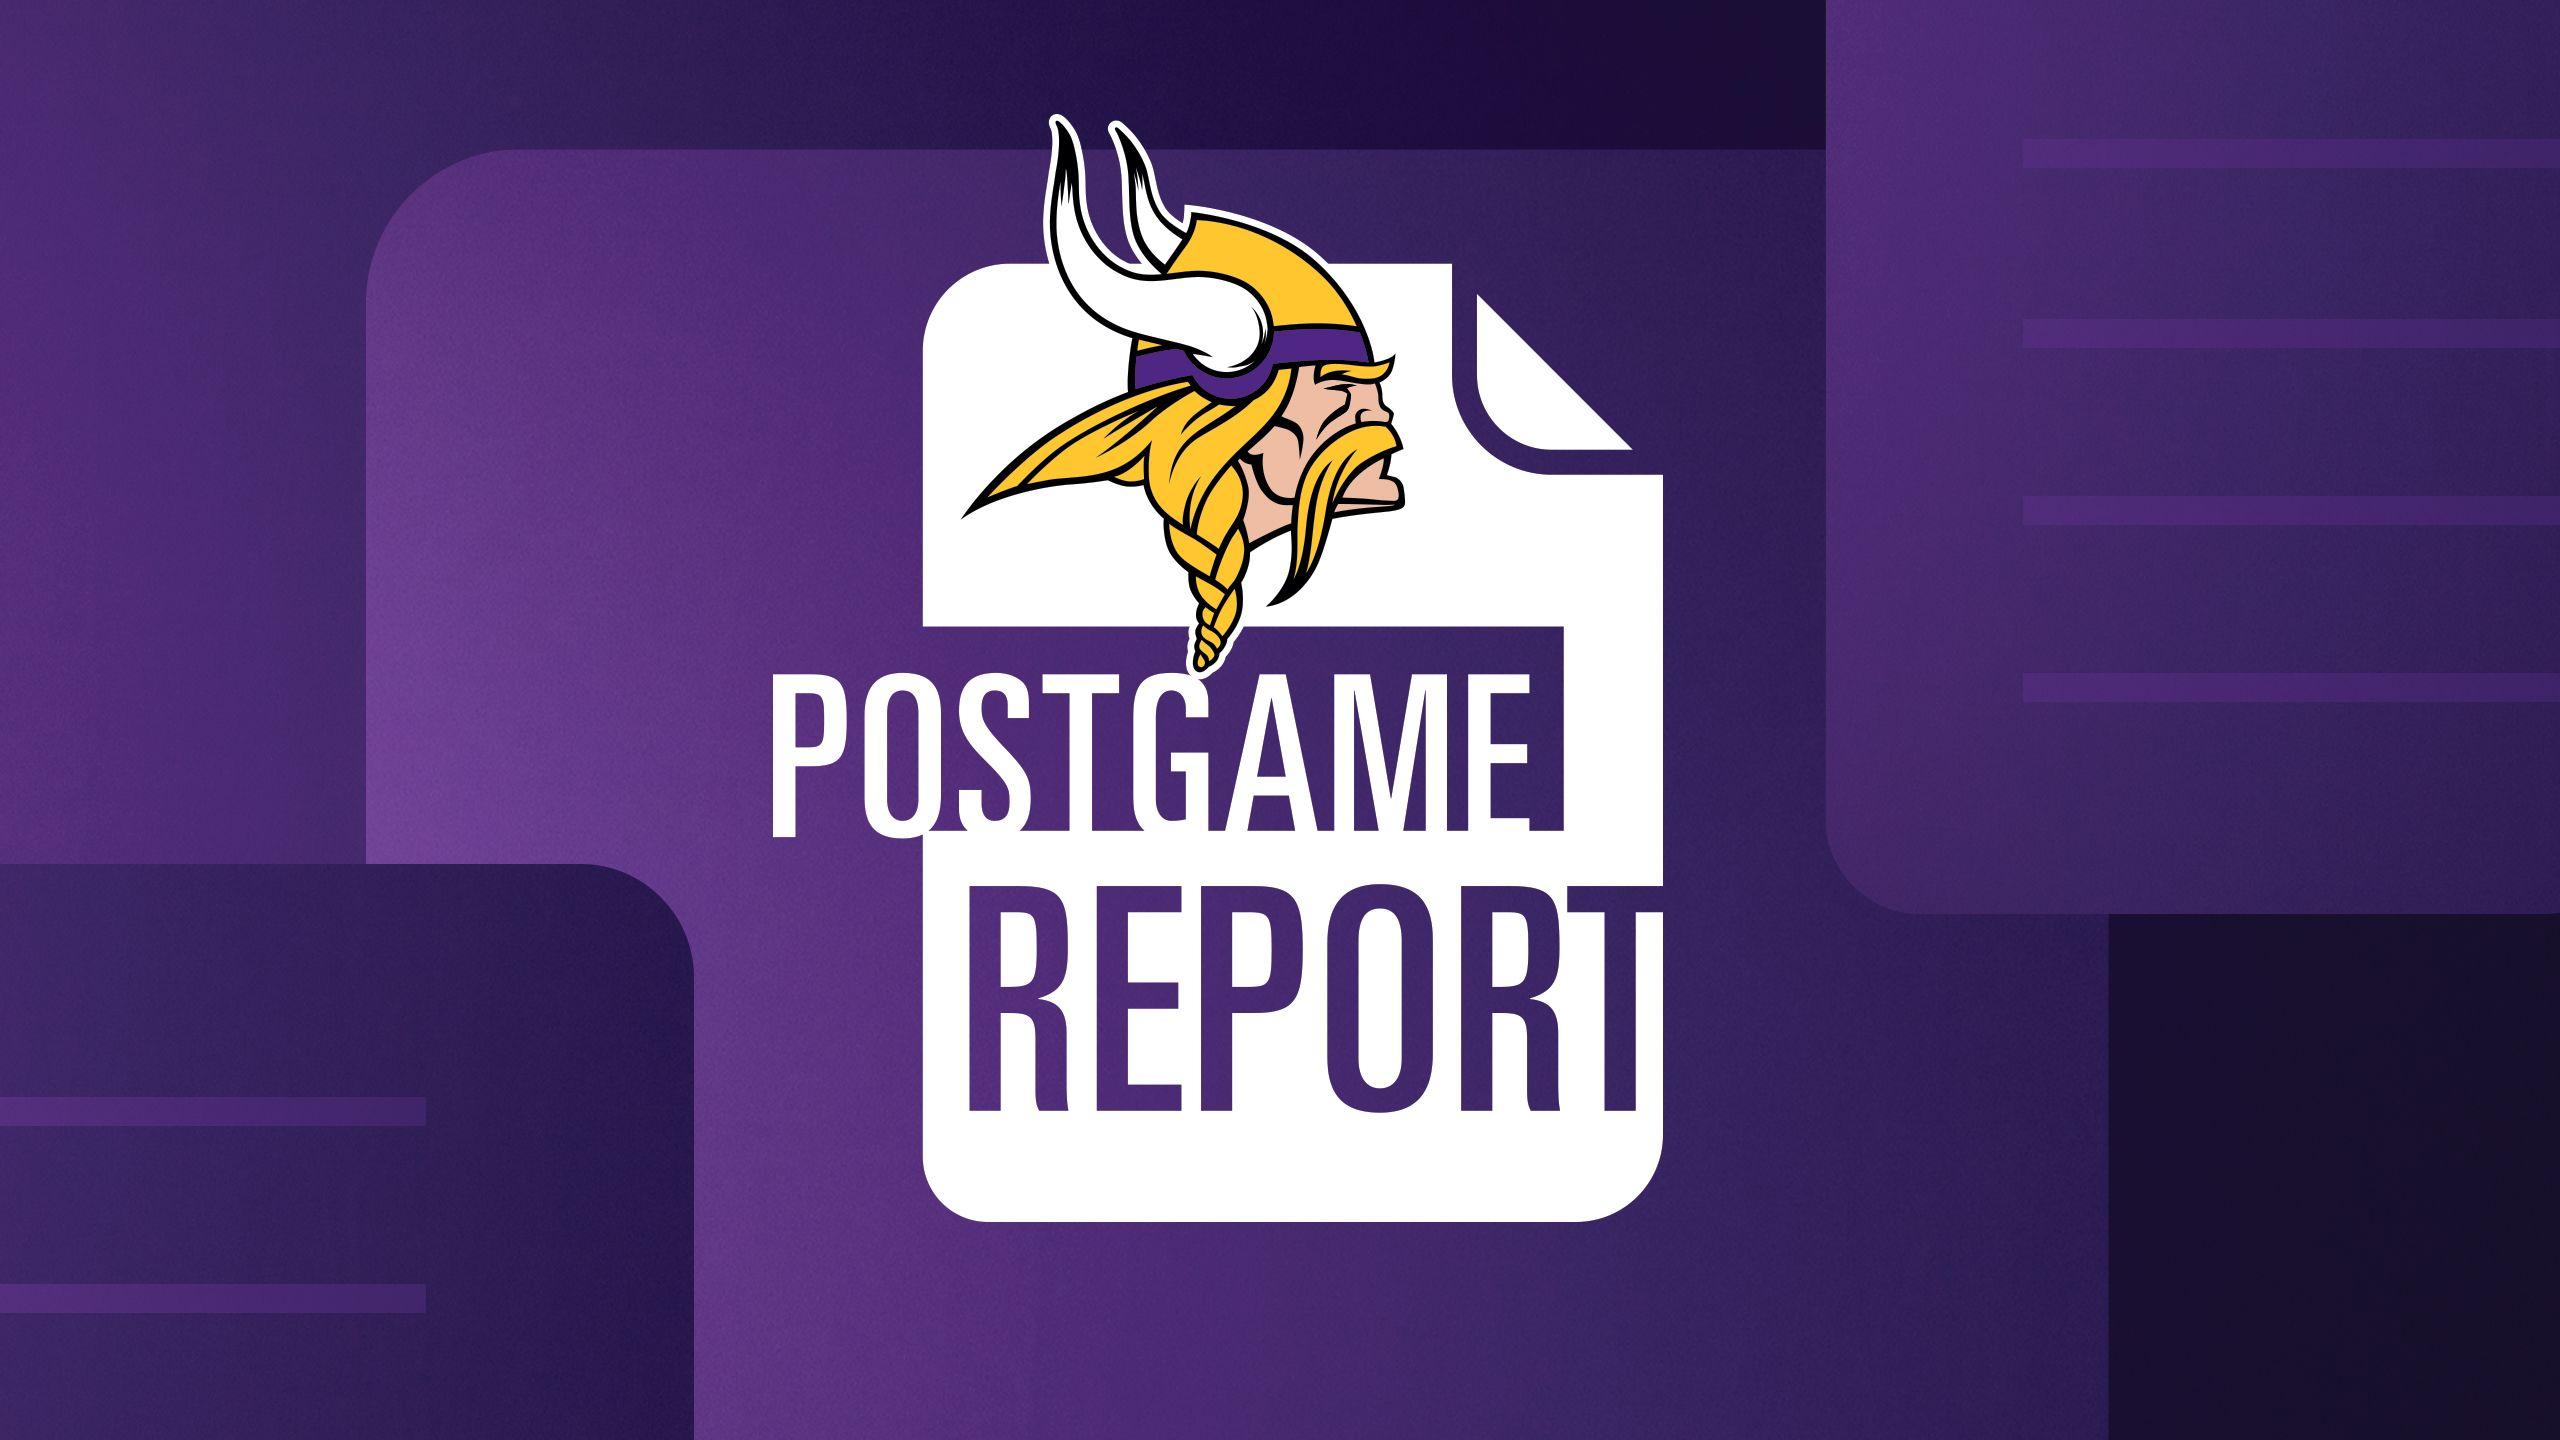 Postgame Report